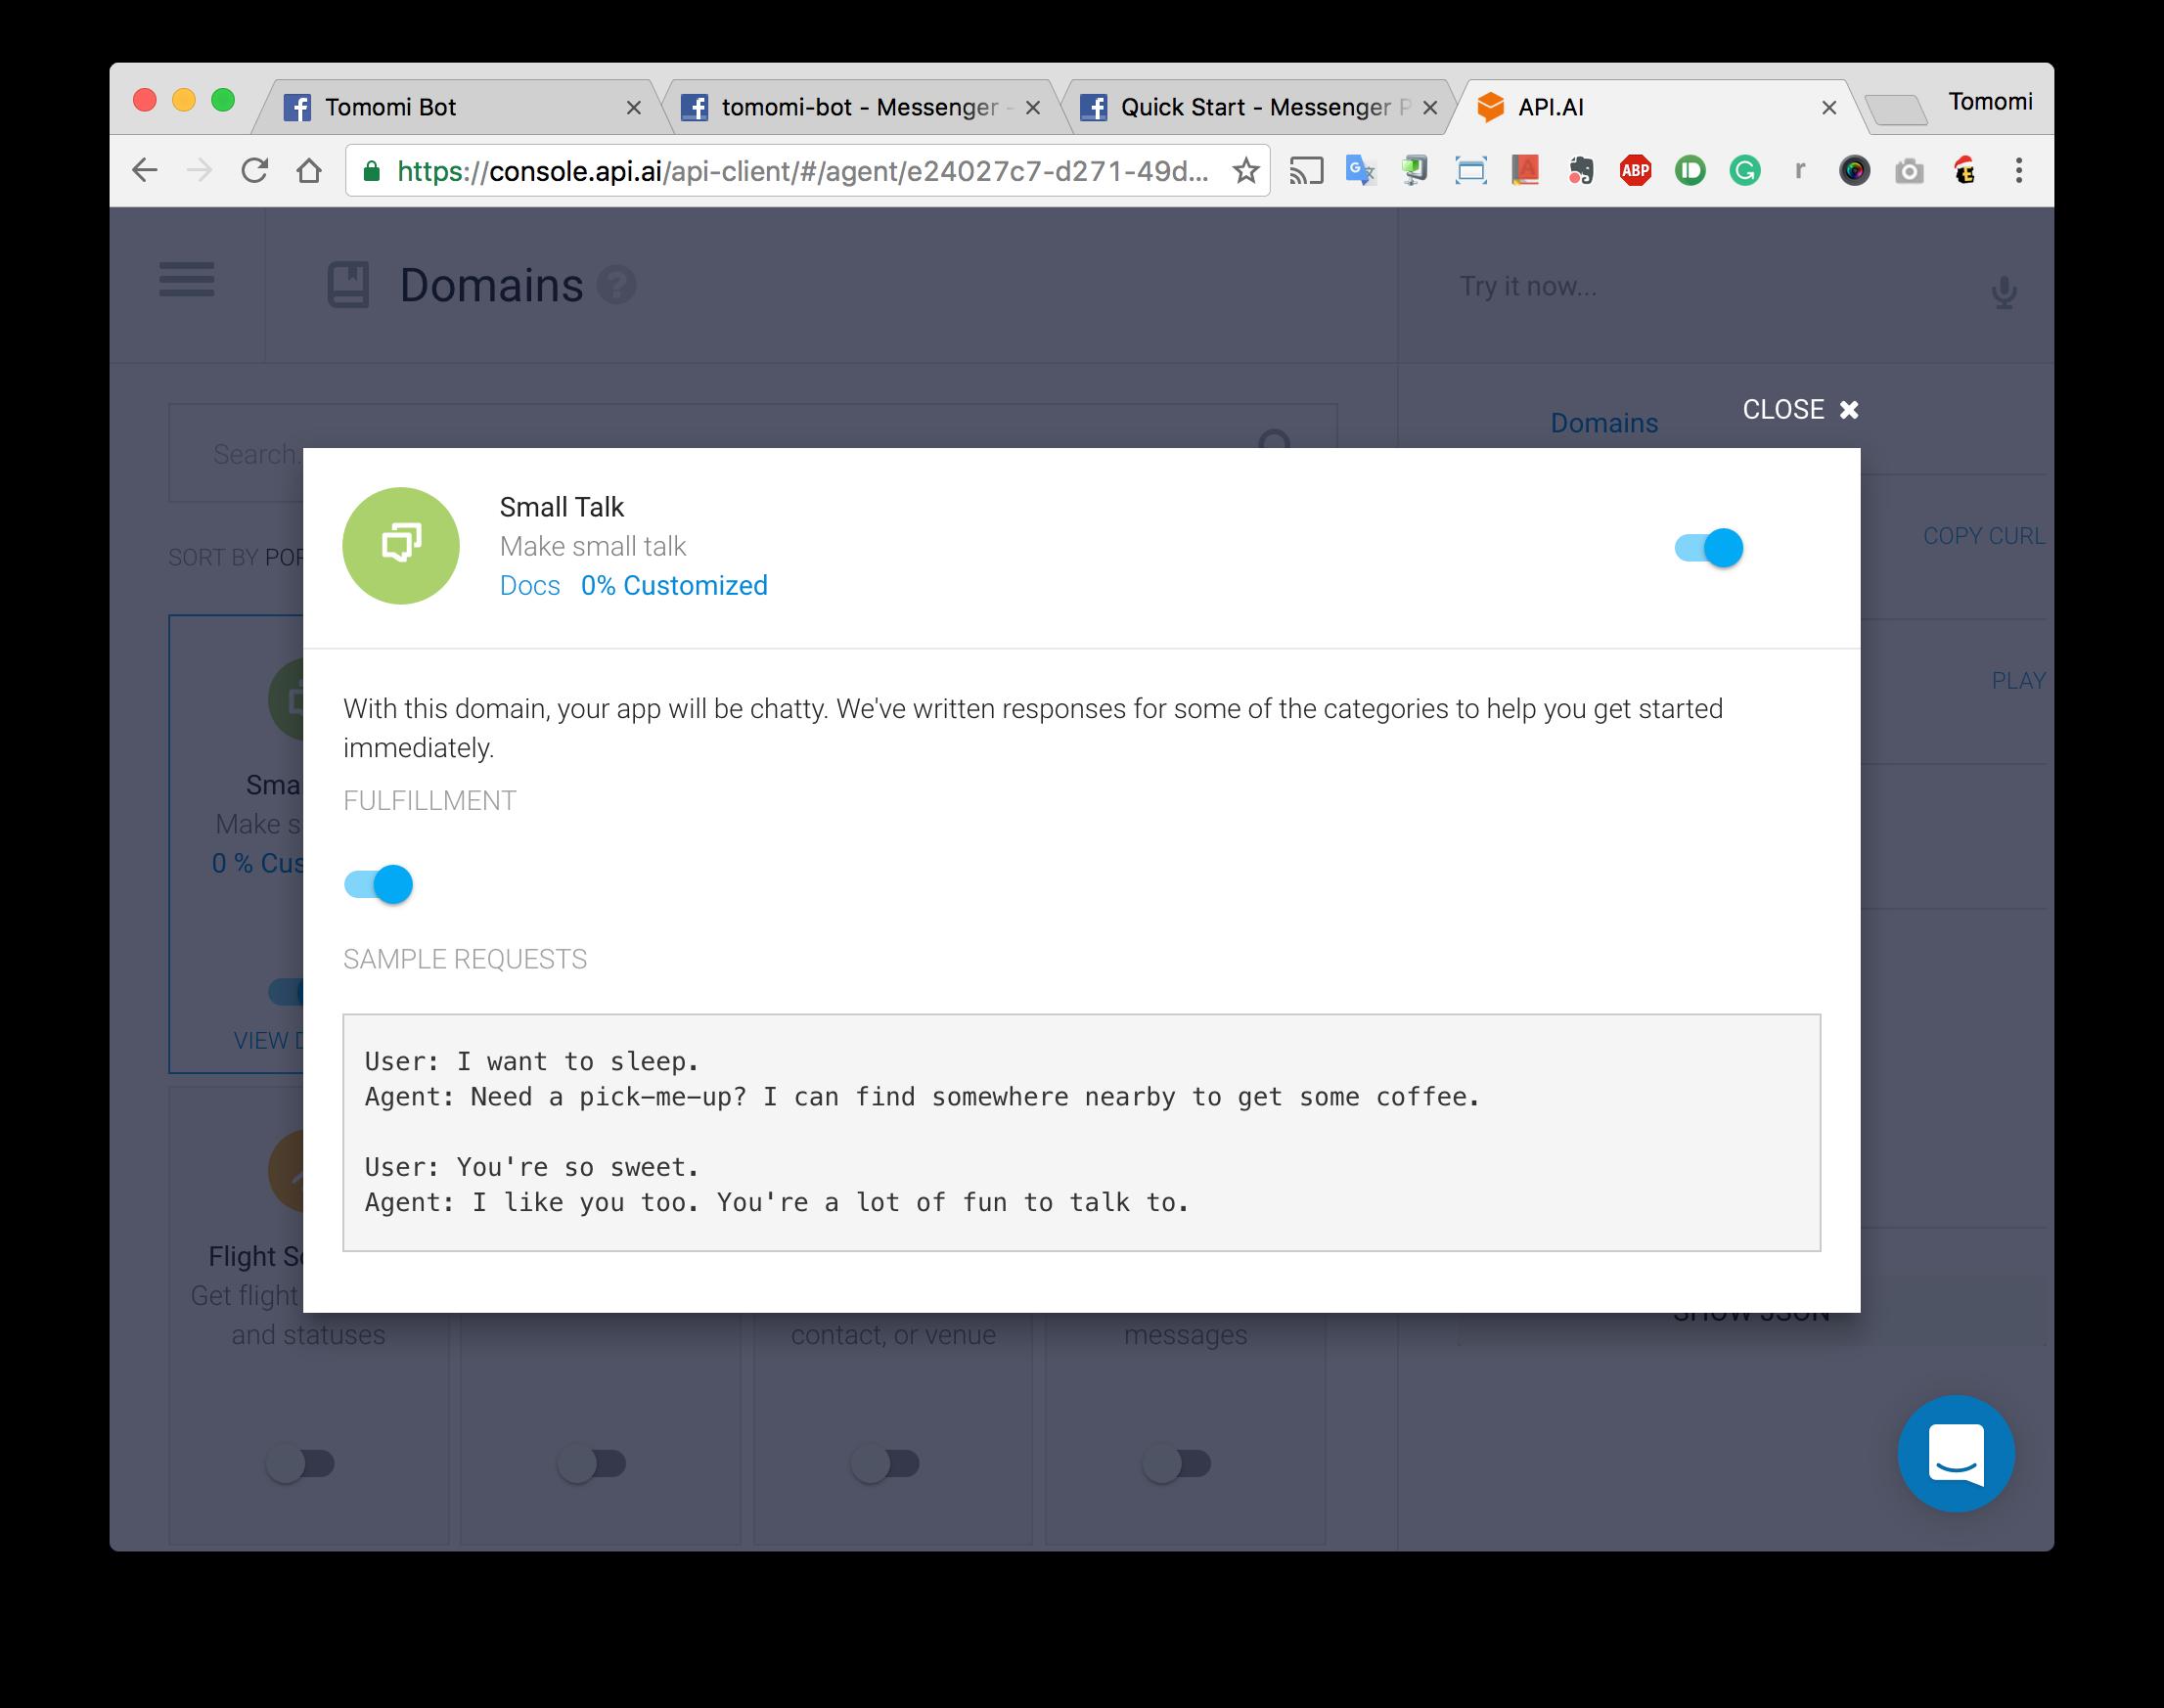 Creating a Simple Facebook Messenger AI Bot with API ai in Node js